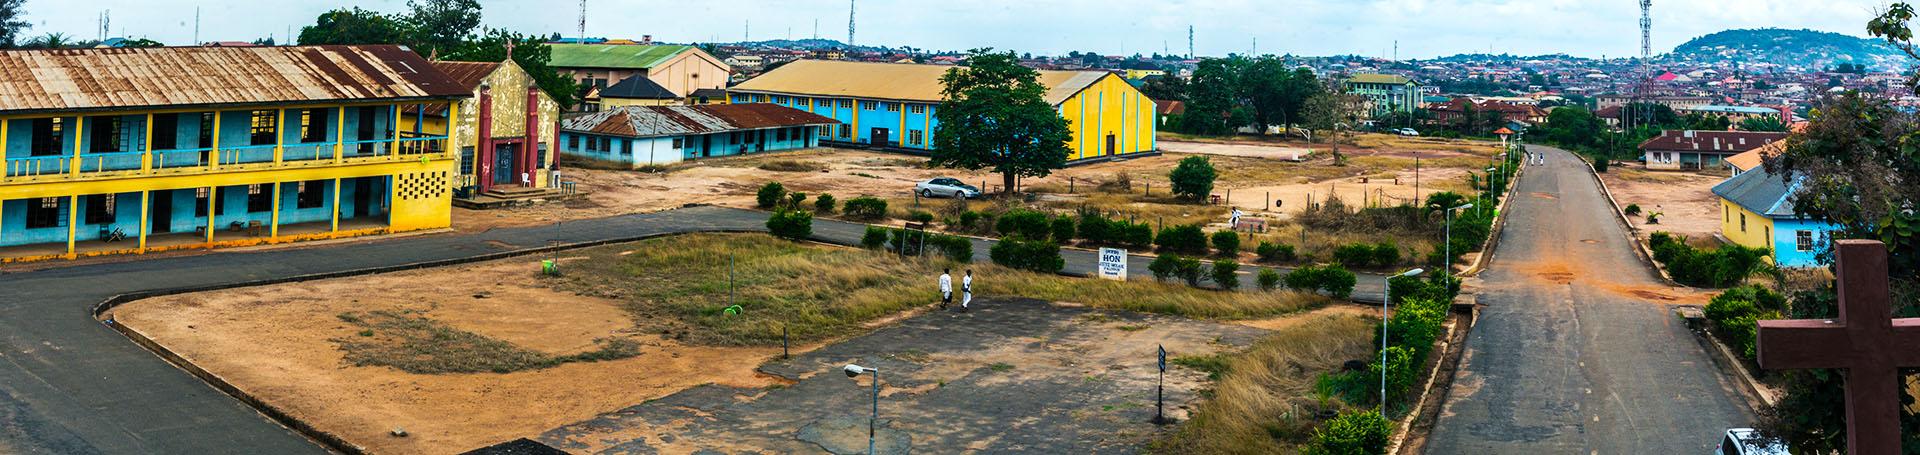 Aquinas College-Bishop Hughe_s Tower. Akure, Ondo, Nigeria